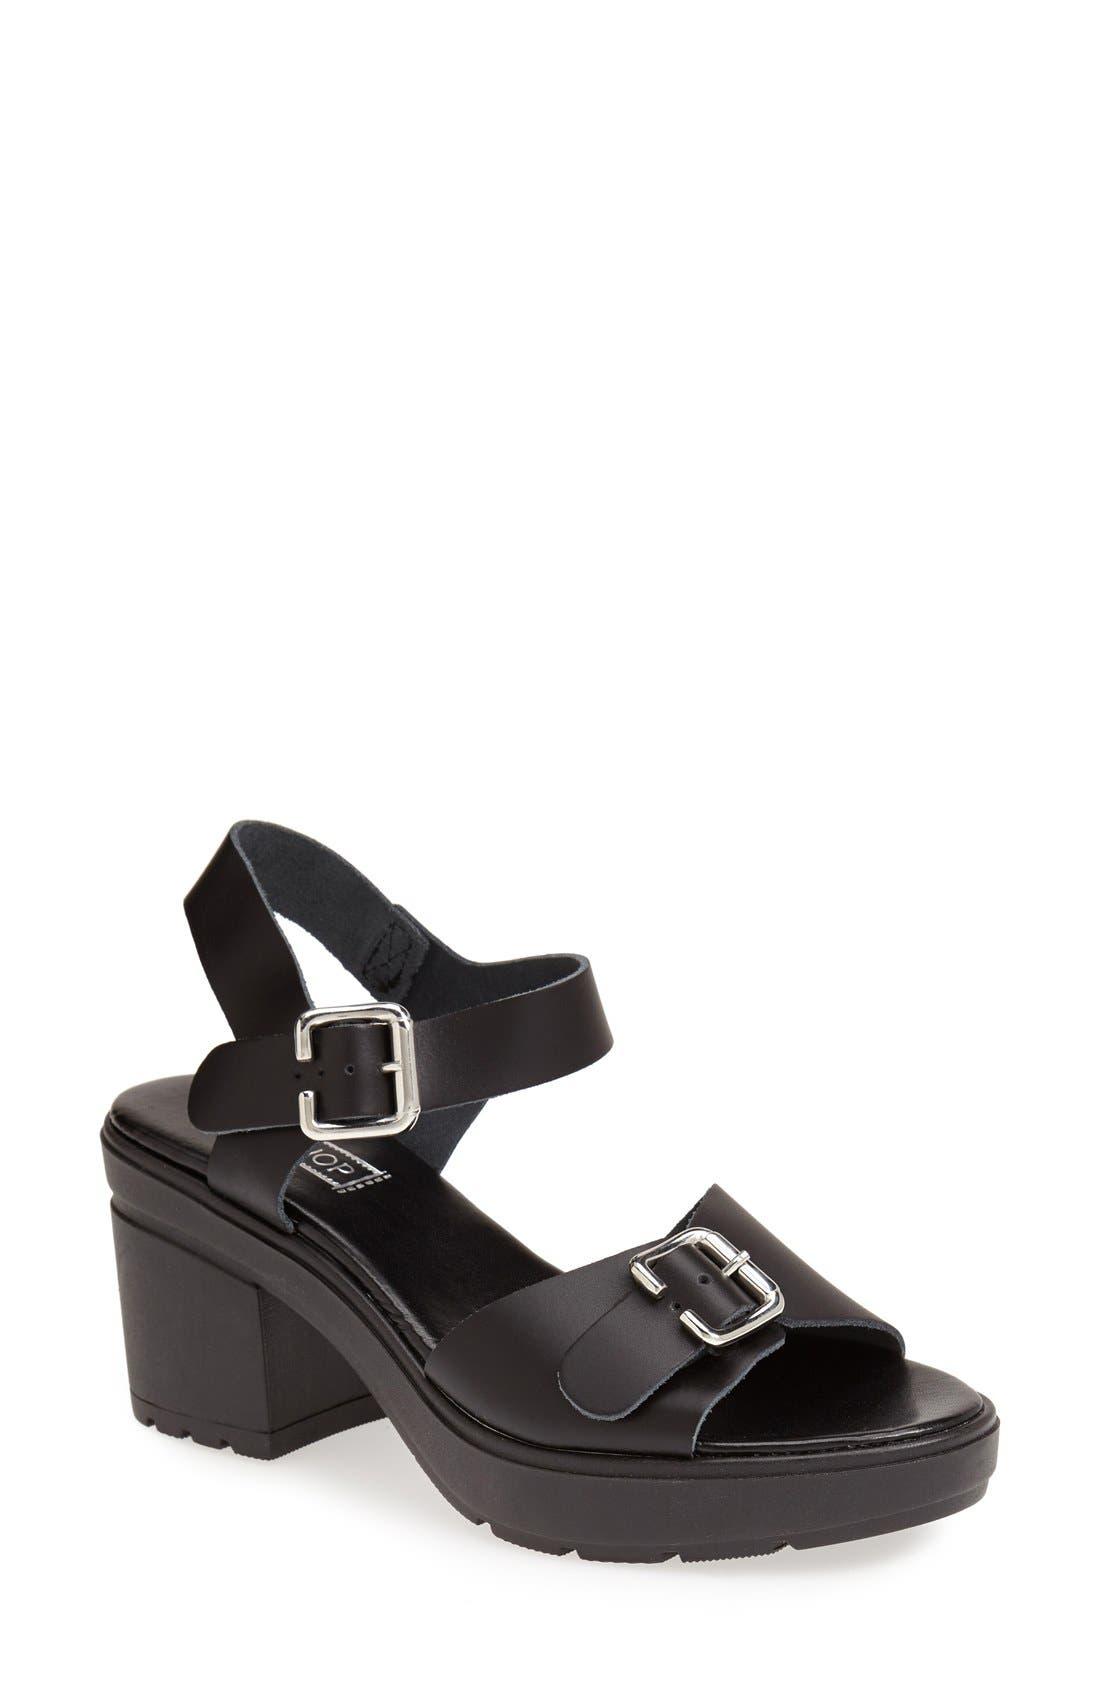 Alternate Image 1 Selected - Topshop 'Niece' Platform Leather Sandal (Women)